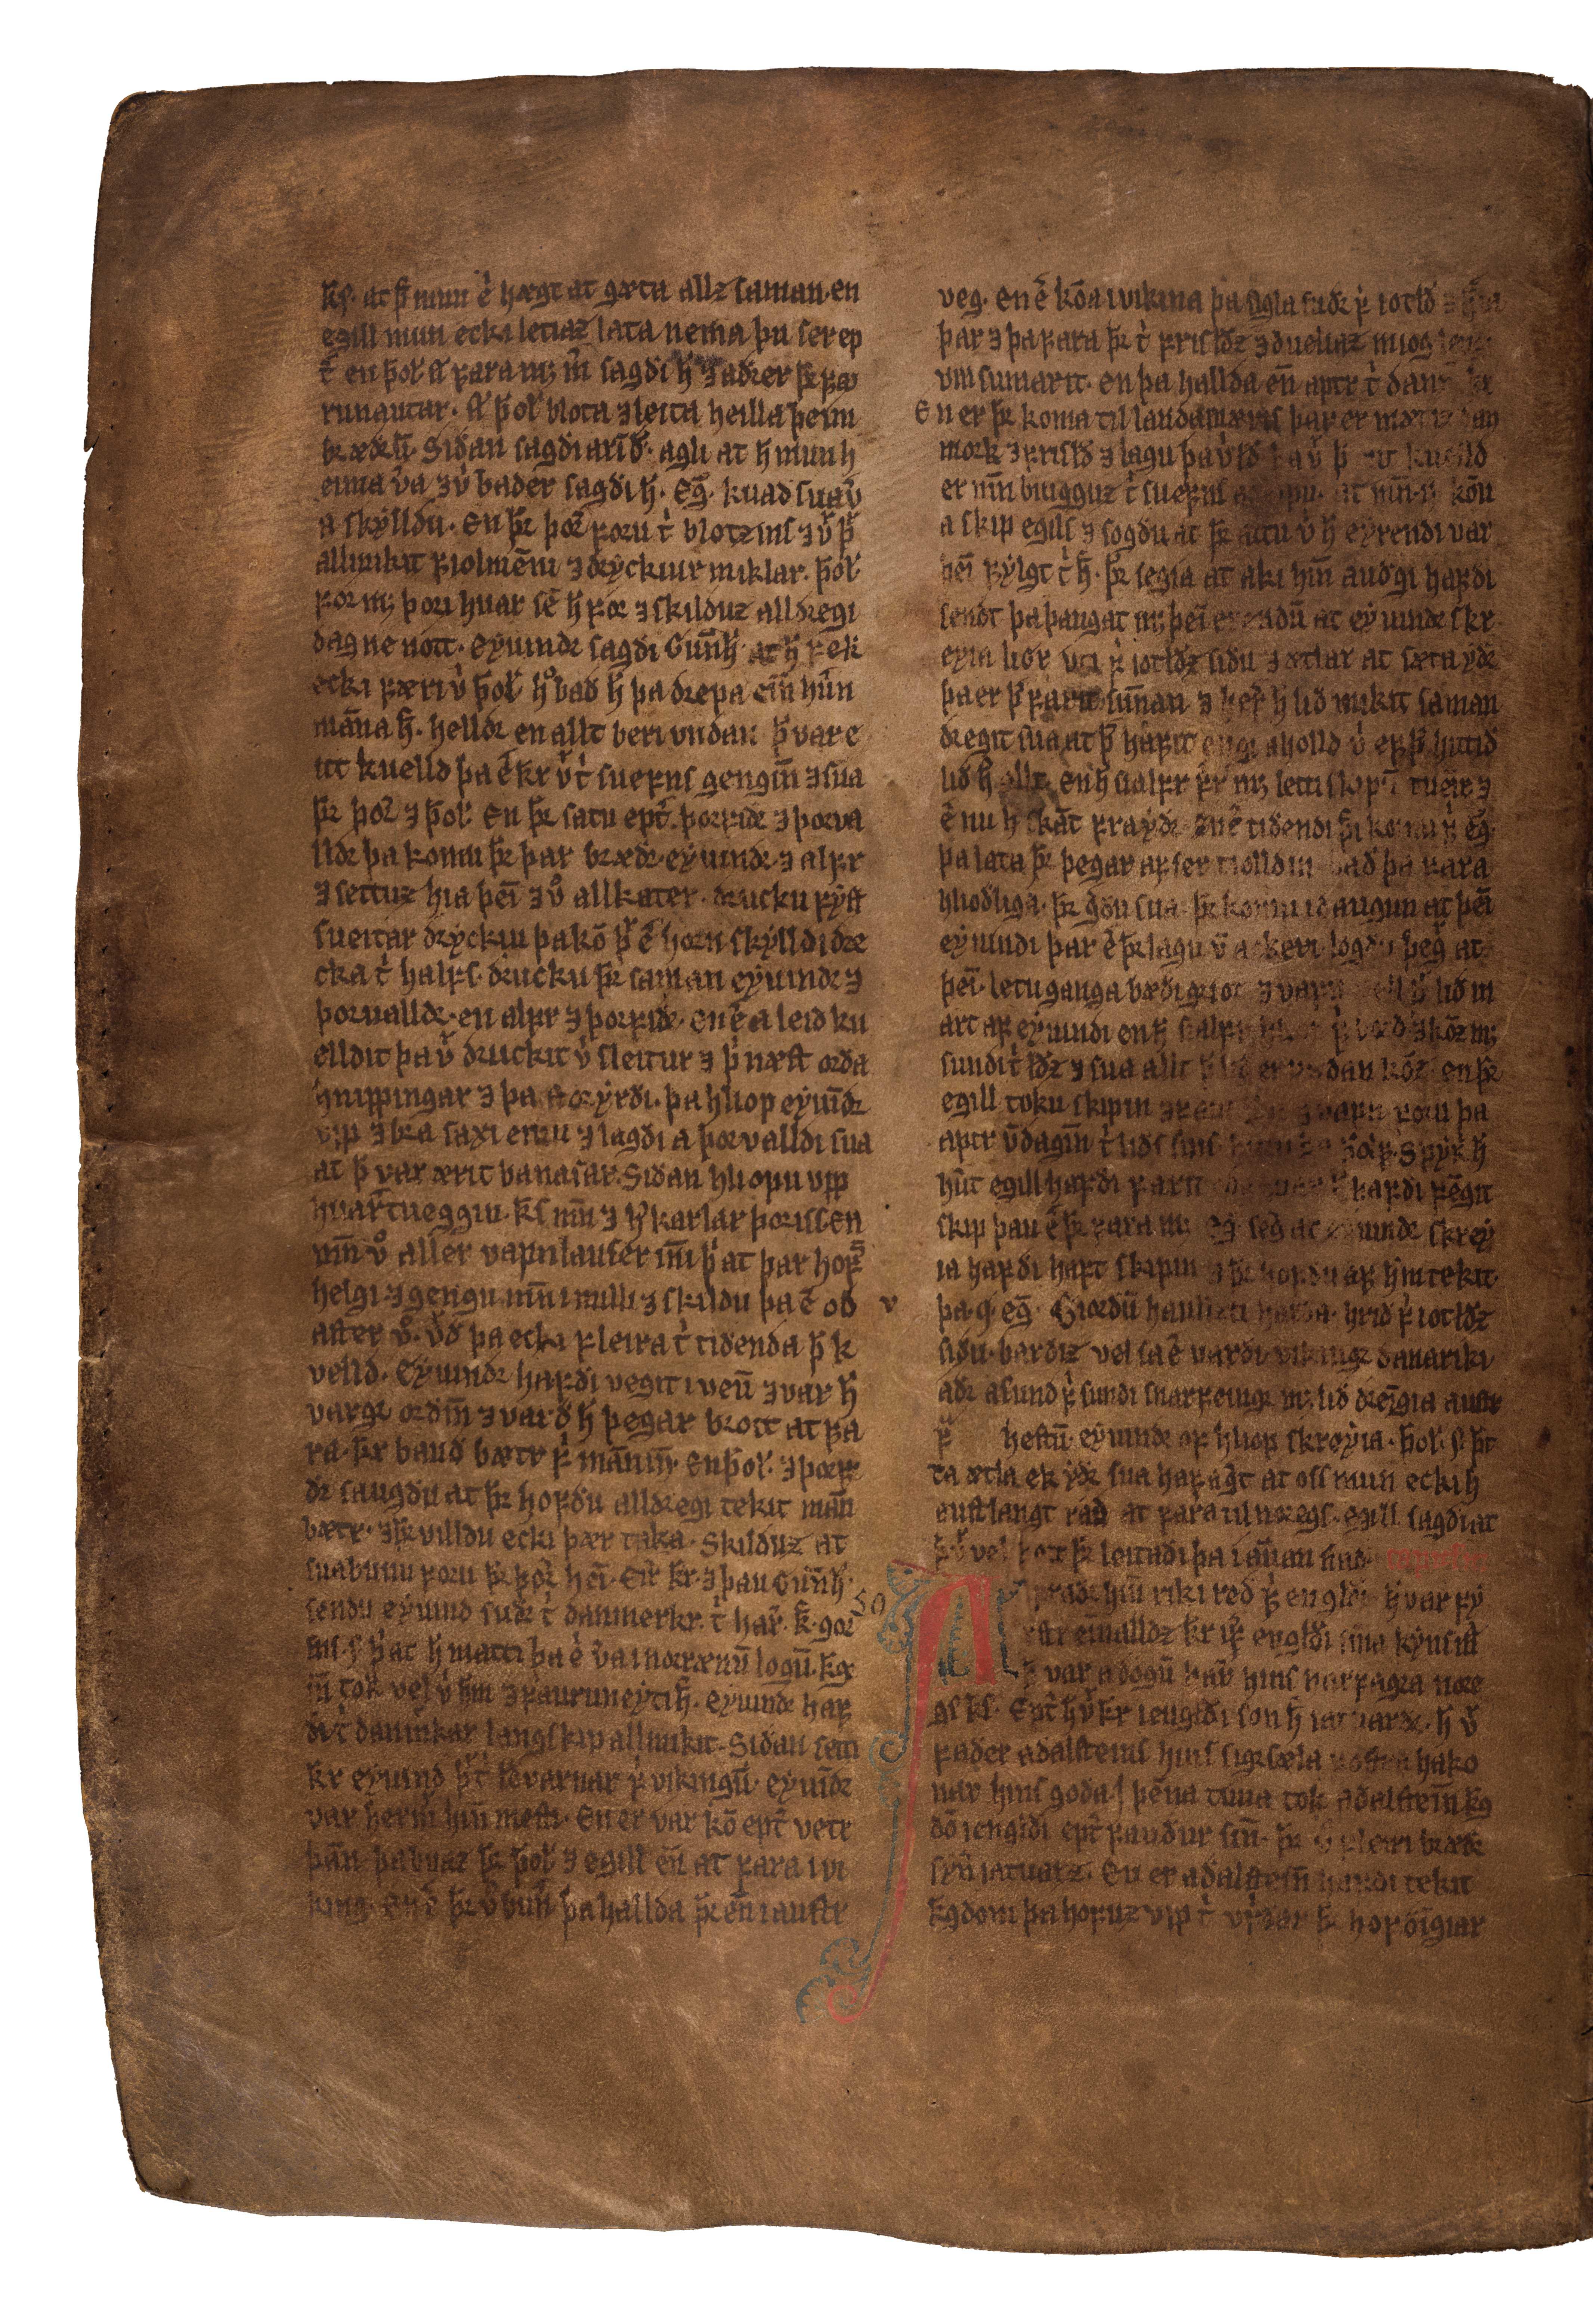 AM 132 fol - 79v